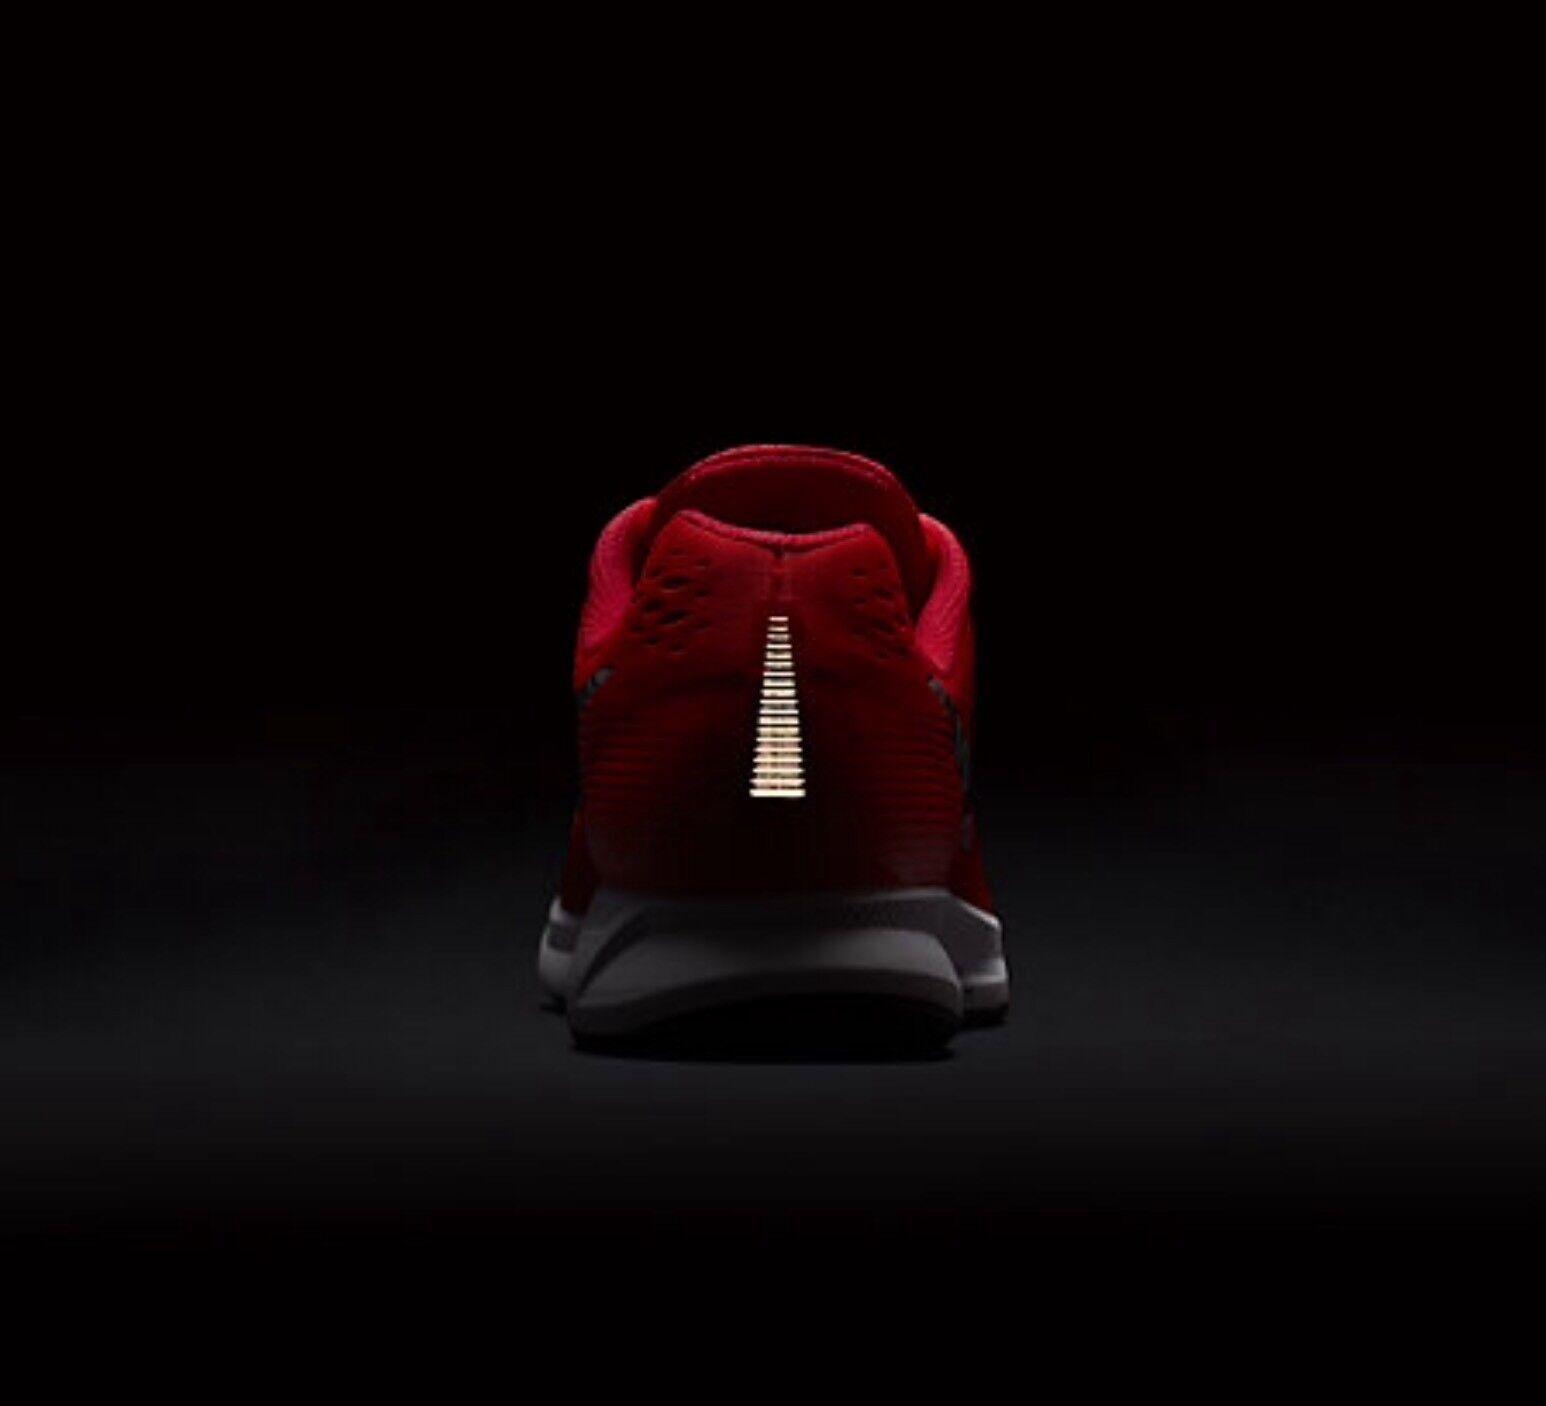 Nike Air Zoom Pegasus Hommes 34 MO FARAH Limited Edition Hommes Pegasus Chaussure eb426d